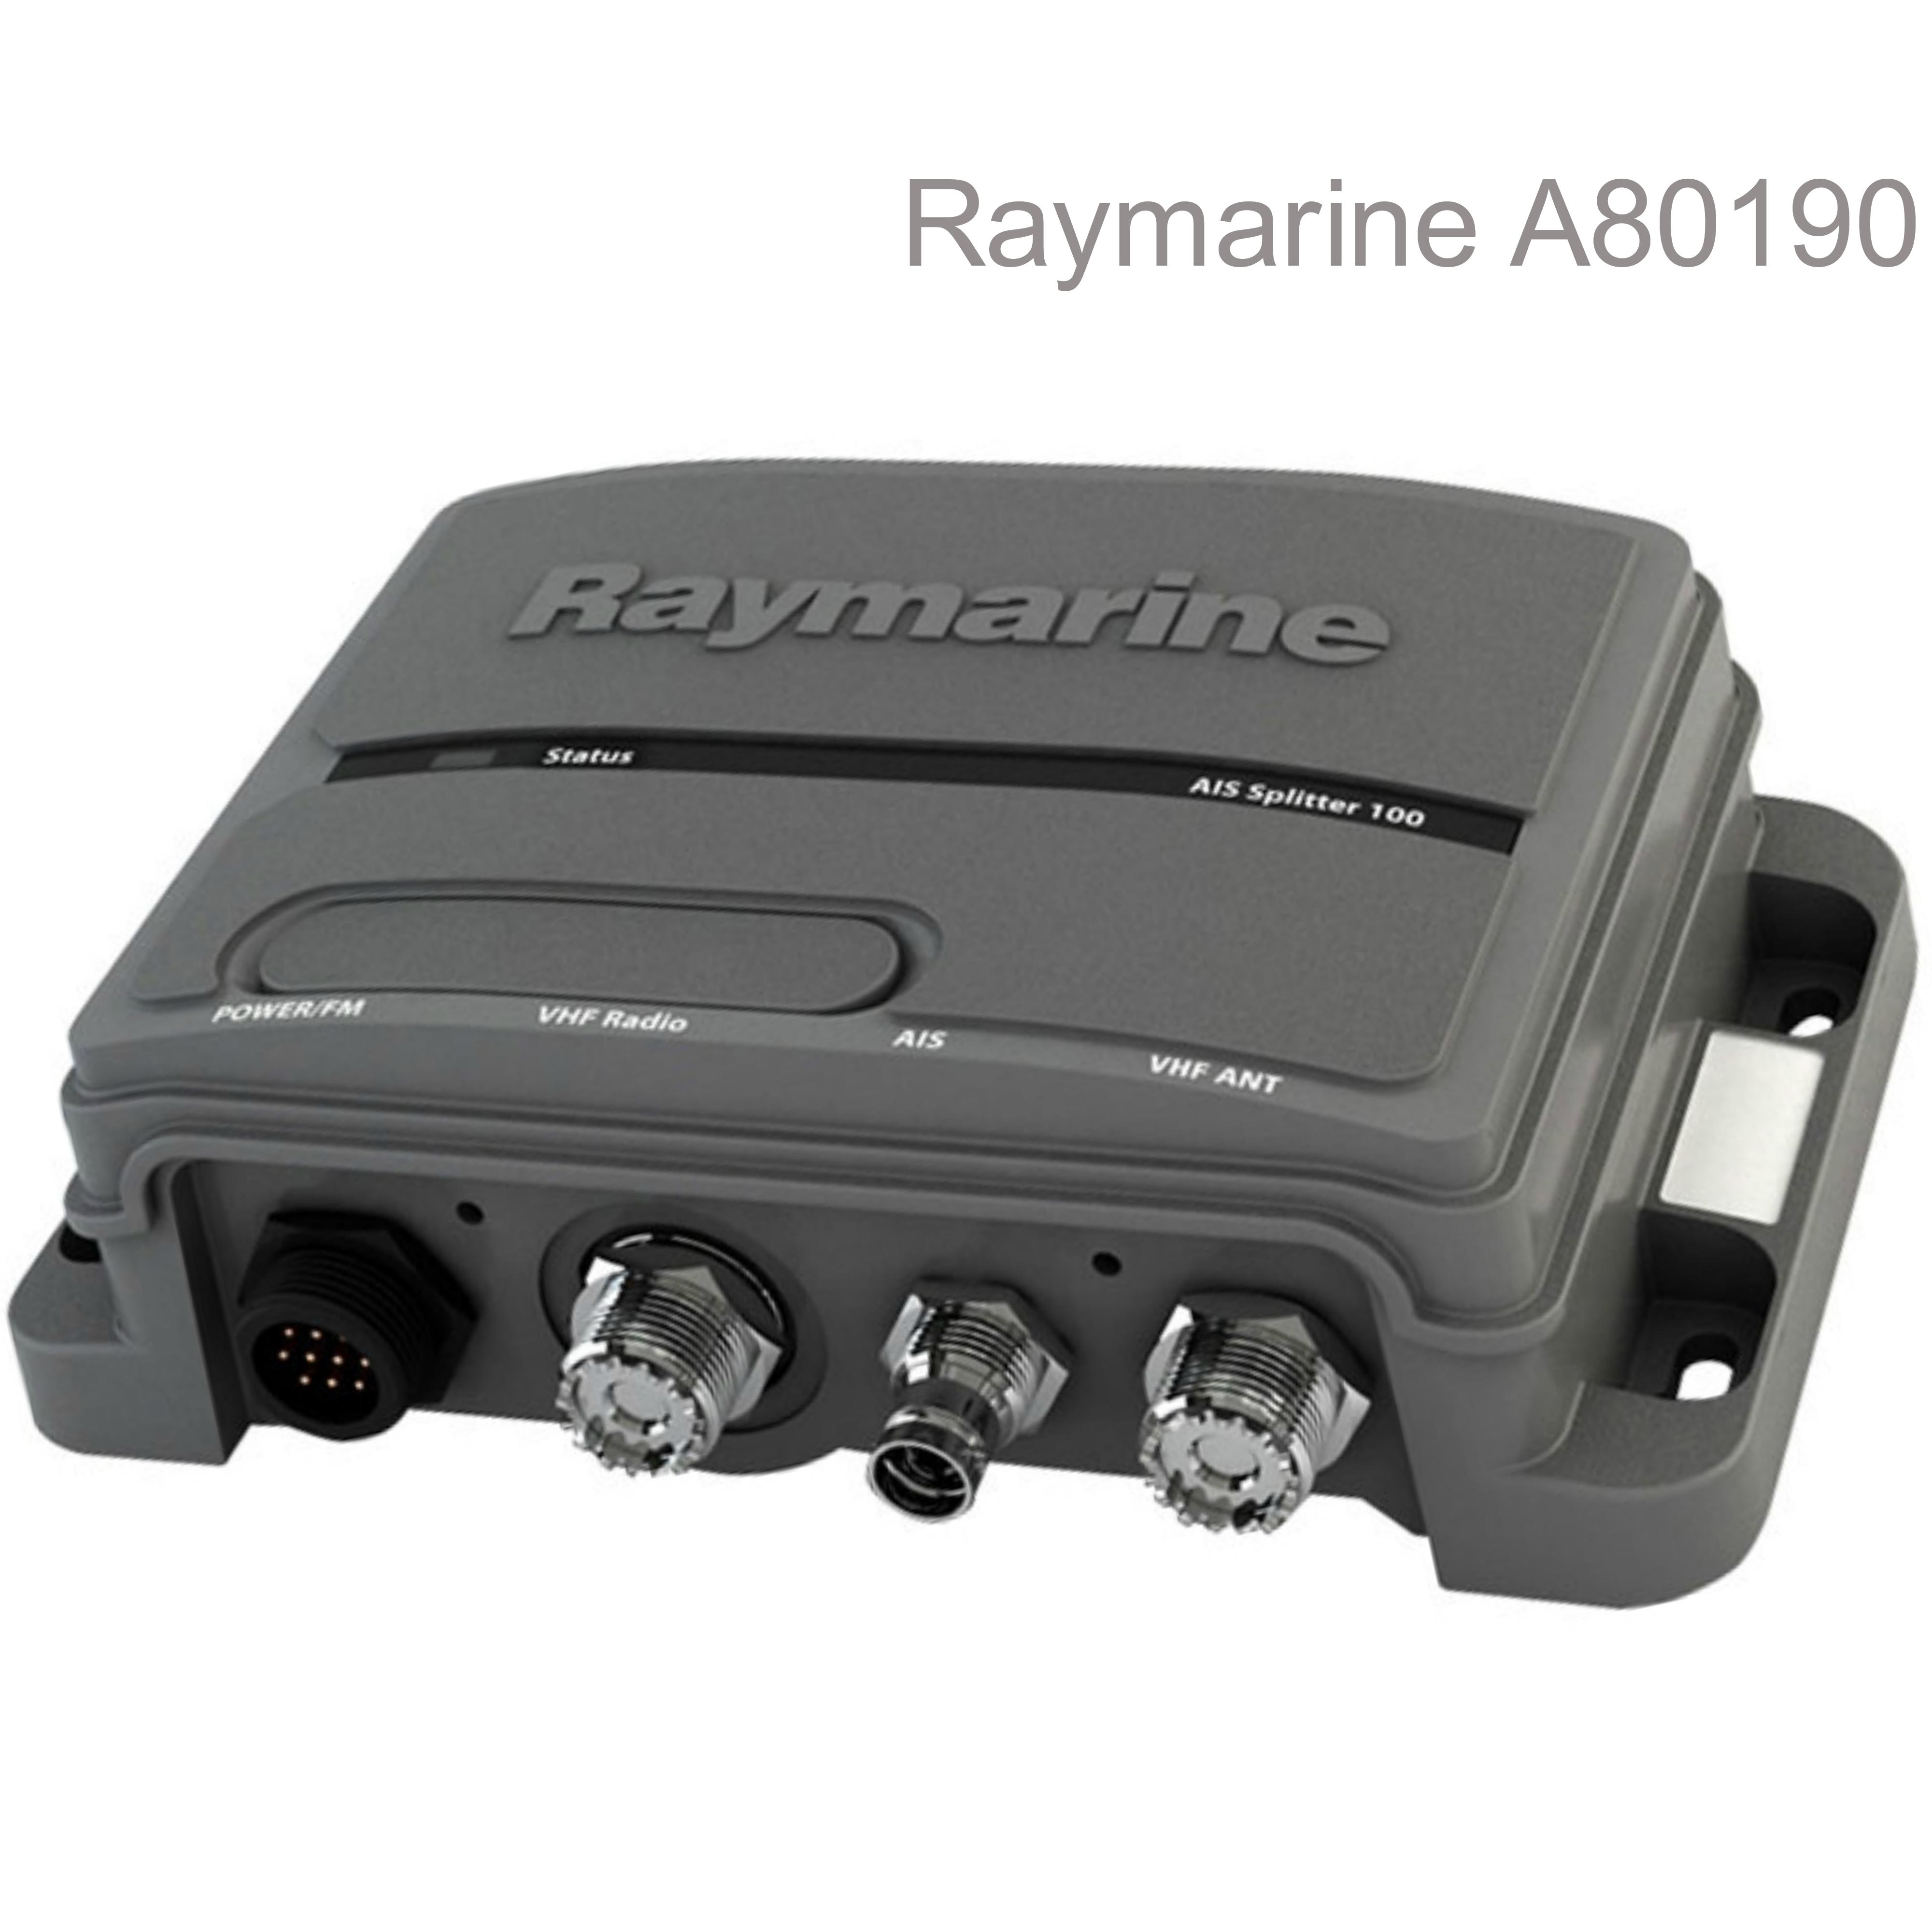 Raymarine A80190|AIS 100 Active Antenna Signals Splitter|For Class B AIS/VHF/FM Radio